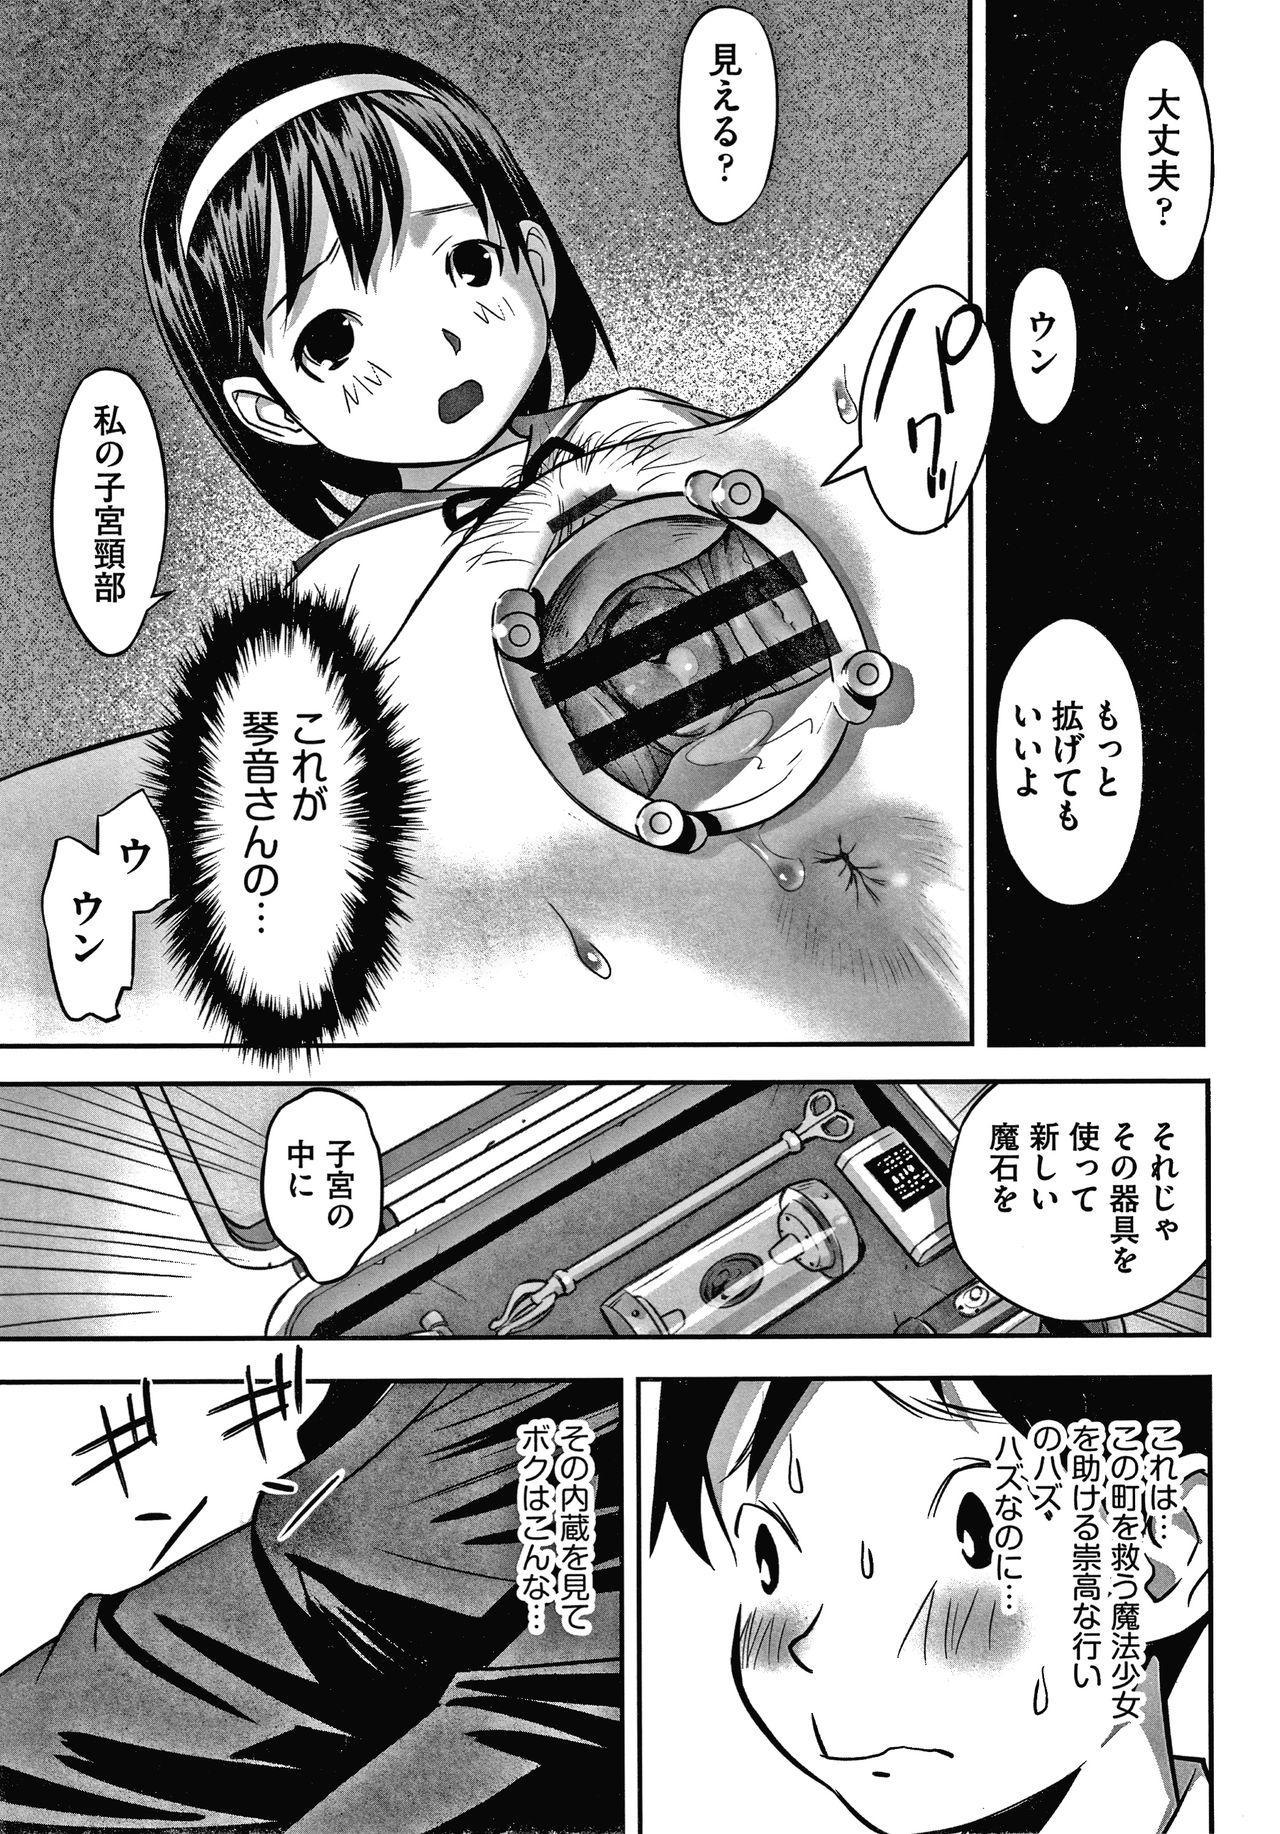 Shoujo Kumikyoku 15 113